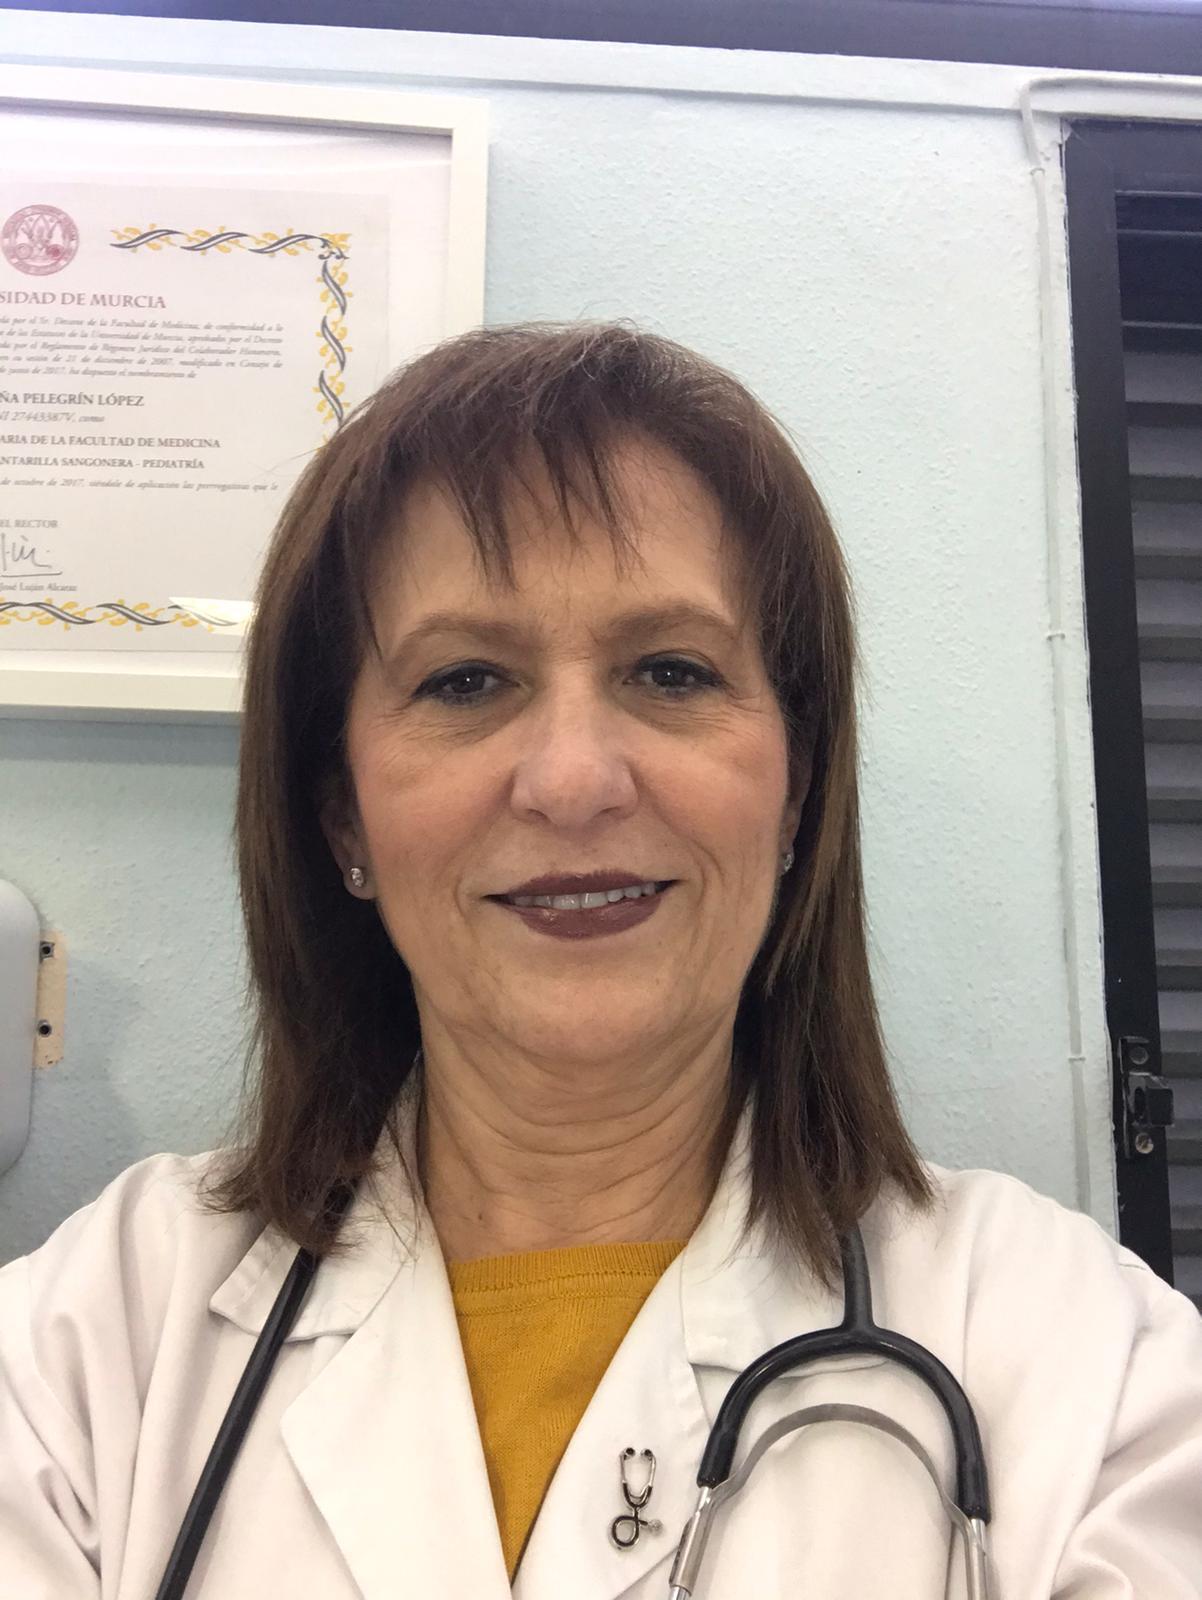 Dr. Begoña Pelegrin Lopez